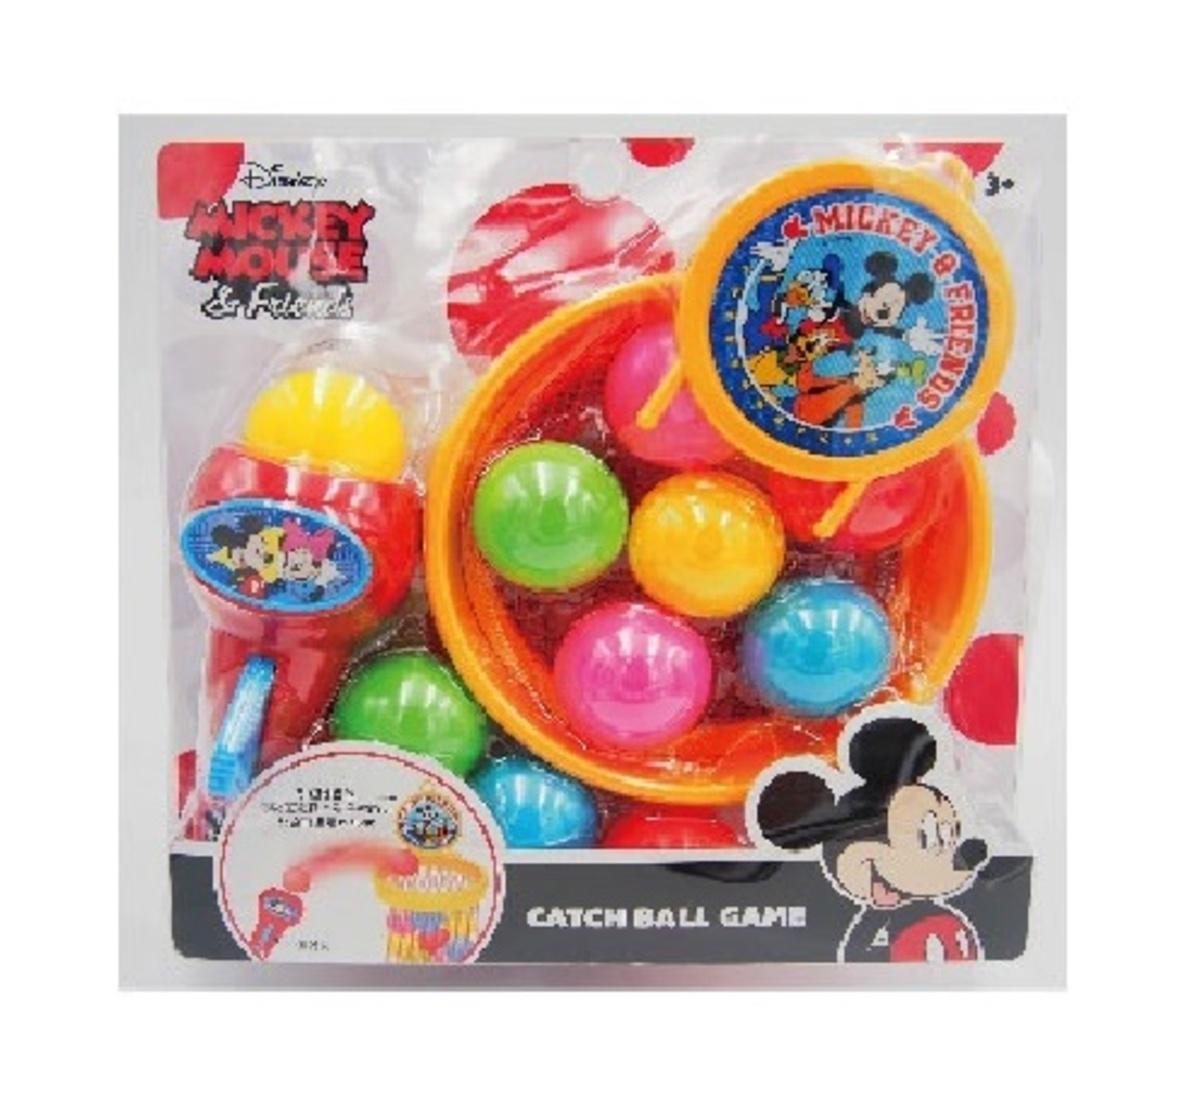 Mickey Catch Ball Game